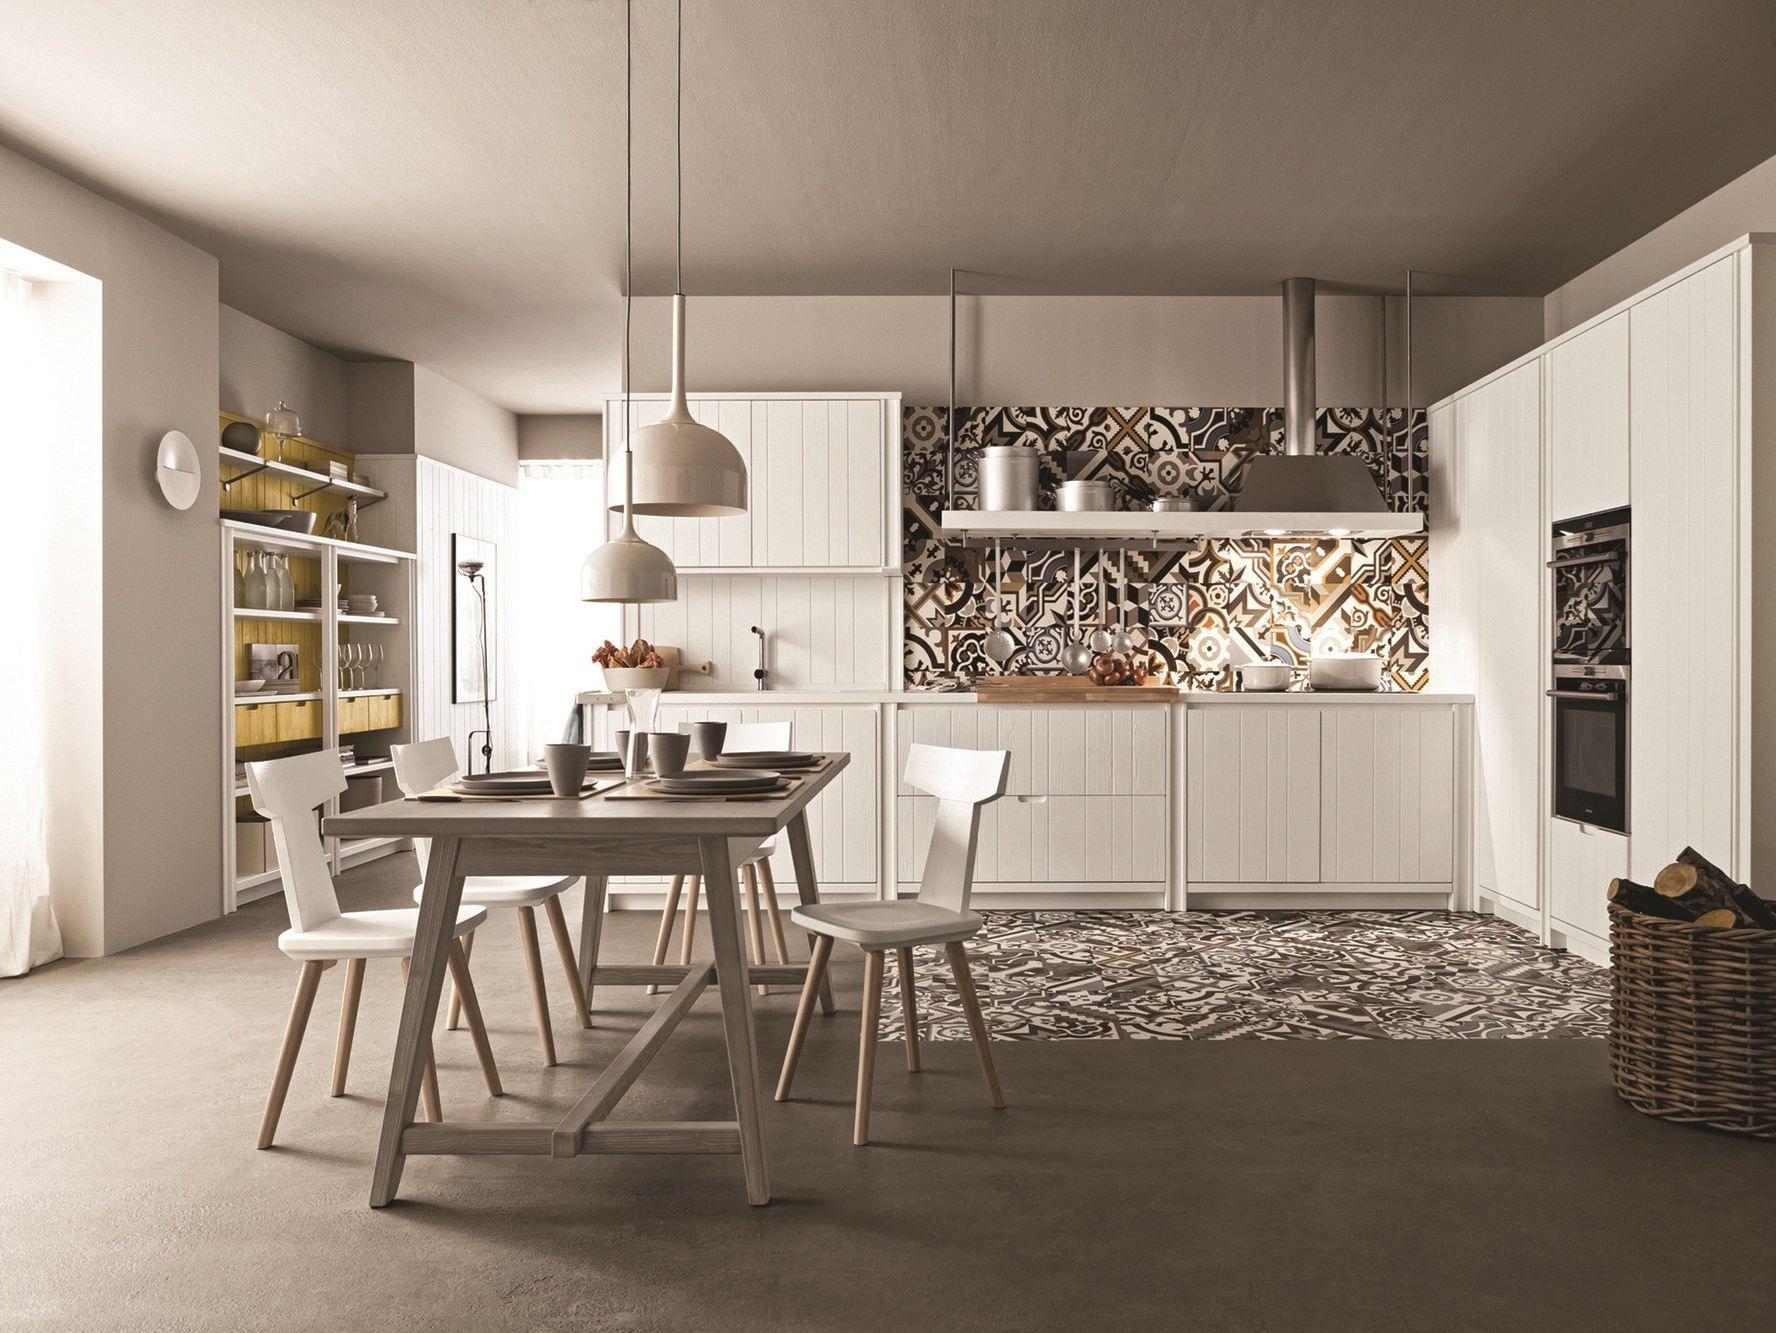 Tavolo Scandola ~ Linear spruce kitchen maestrale by scandola mobili